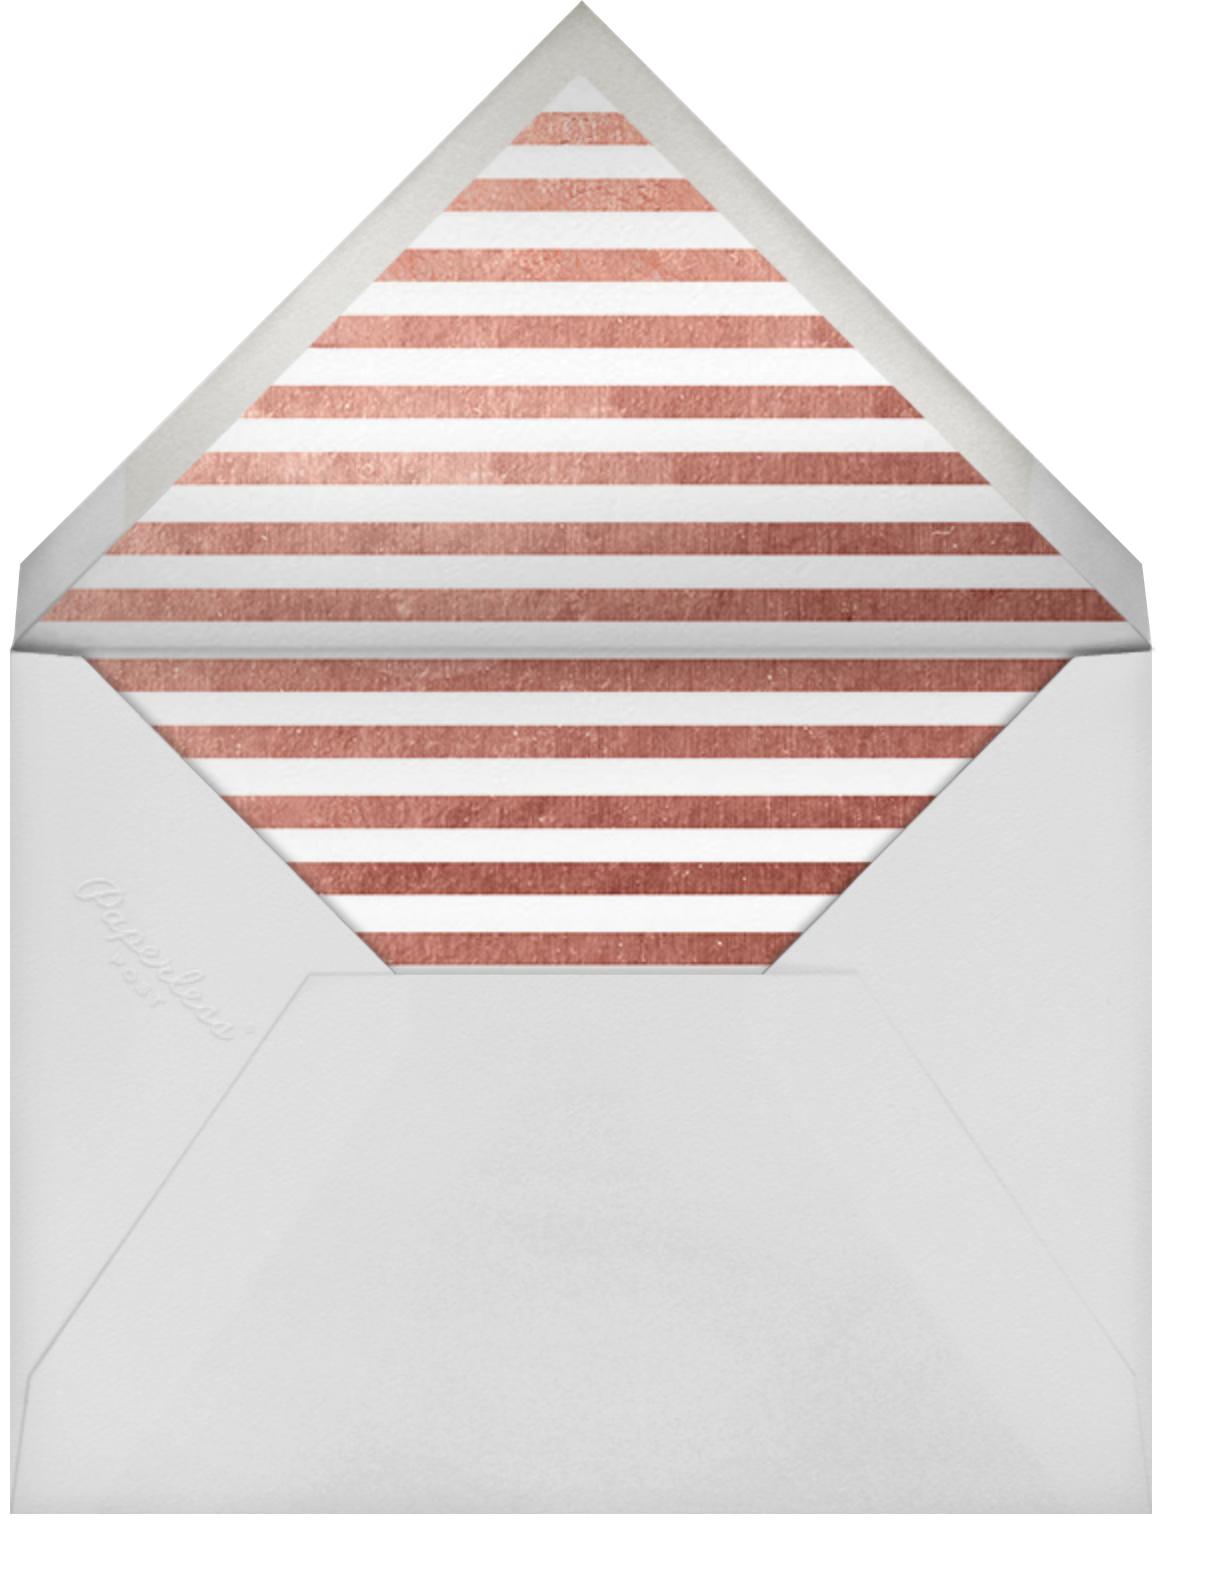 Saint-Preux (Photo) - Black/Rose Gold - Paperless Post - Envelope